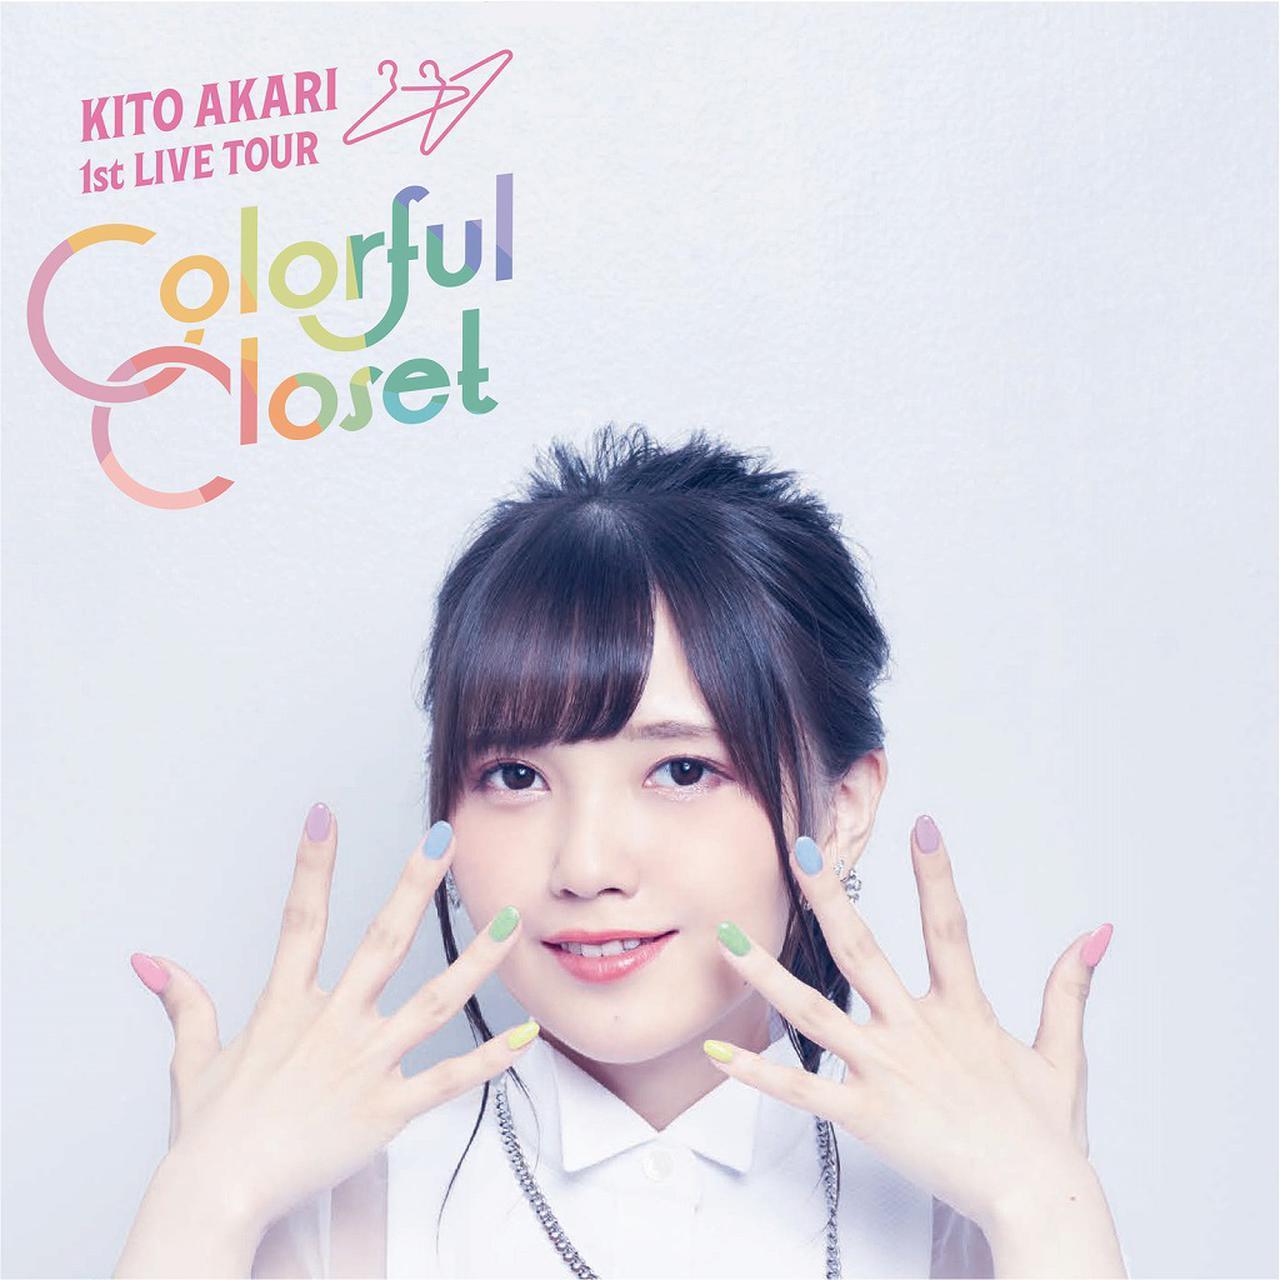 画像: 鬼頭明里 1st LIVE TOUR「Colorful Closet」Stream Selection / 鬼頭明里